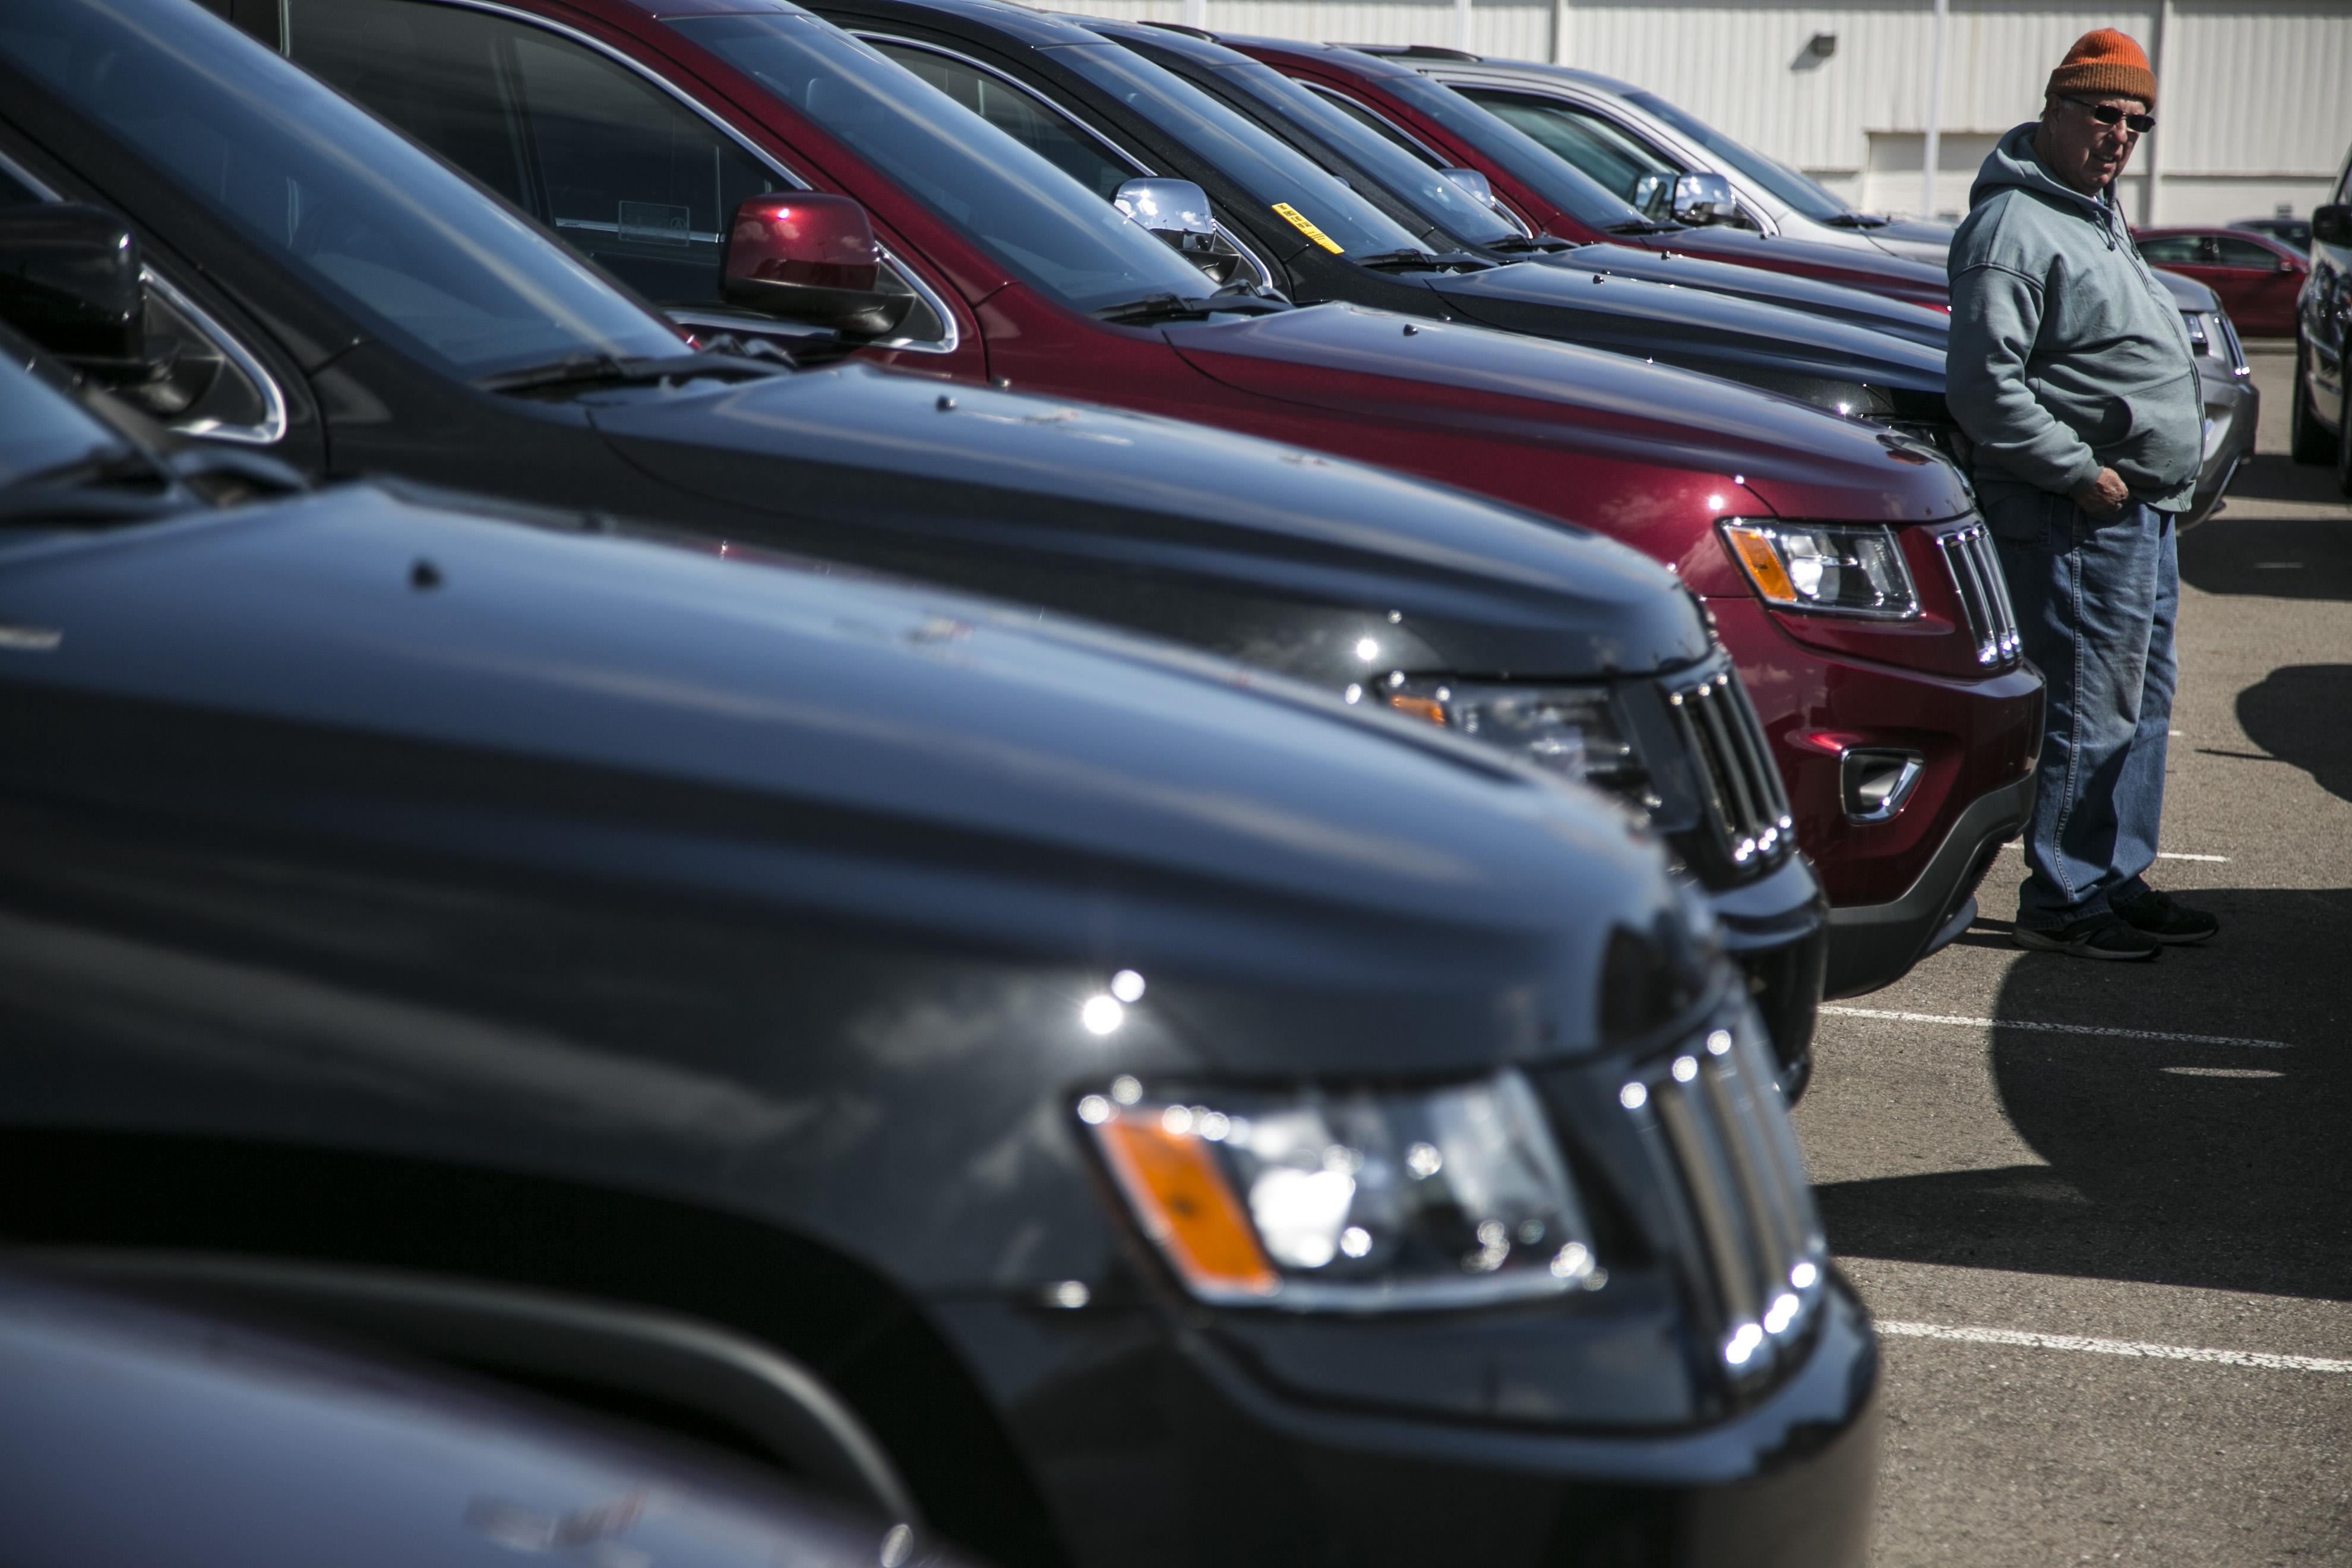 Inside A Car Dealership Ahead Of Motor Vehicle Sales Figures